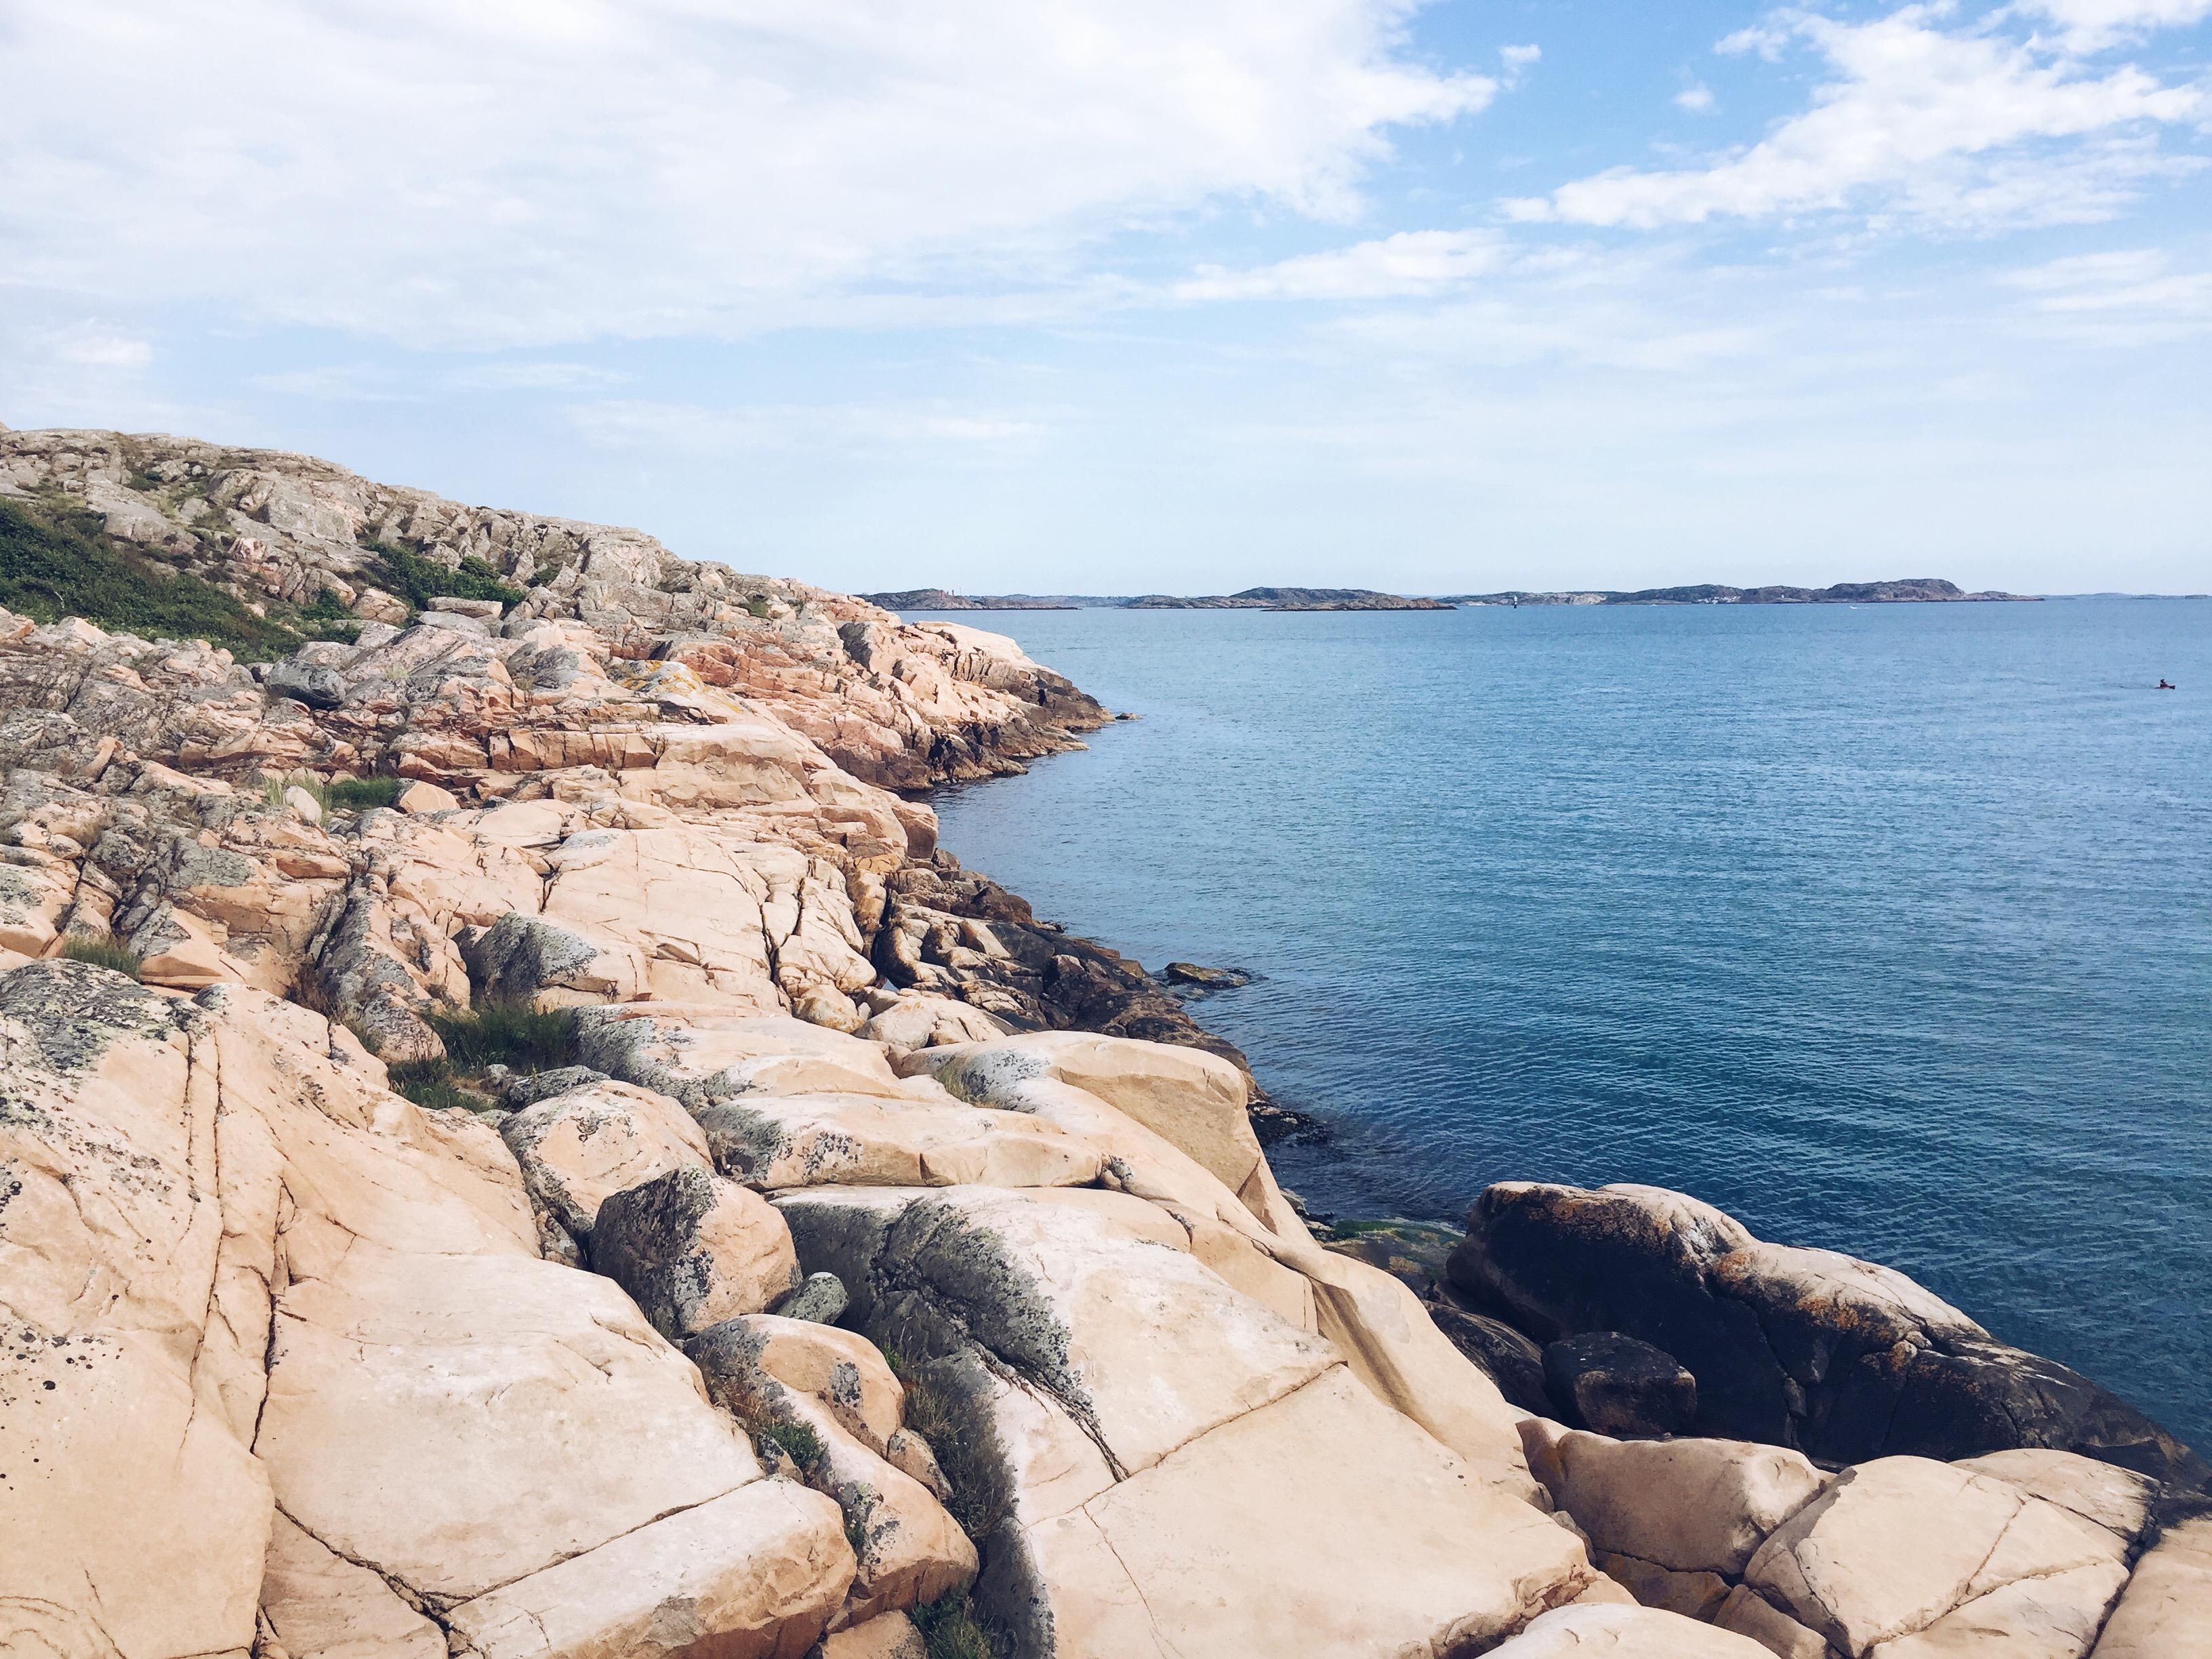 Swedish archipelago, bohus malmön, swedish midsummer, blue hm dress, mixed braid, fishtail braids, bubble braid, swish island, bohus malmön midsummer, bohus malmön midsommar,, swedish summer island